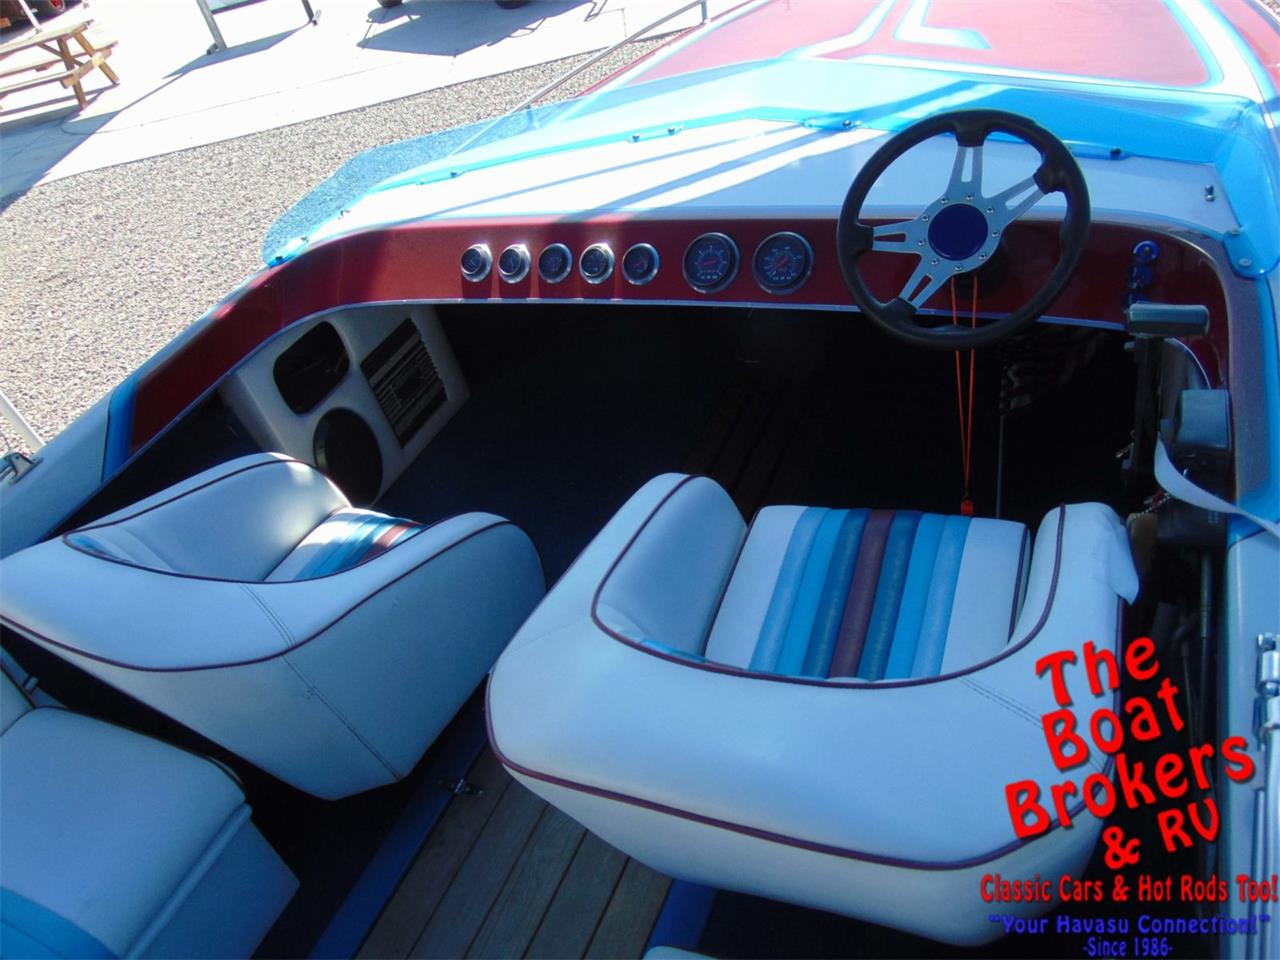 1987 Miscellaneous Boat (CC-1390815) for sale in Lake Havasu, Arizona